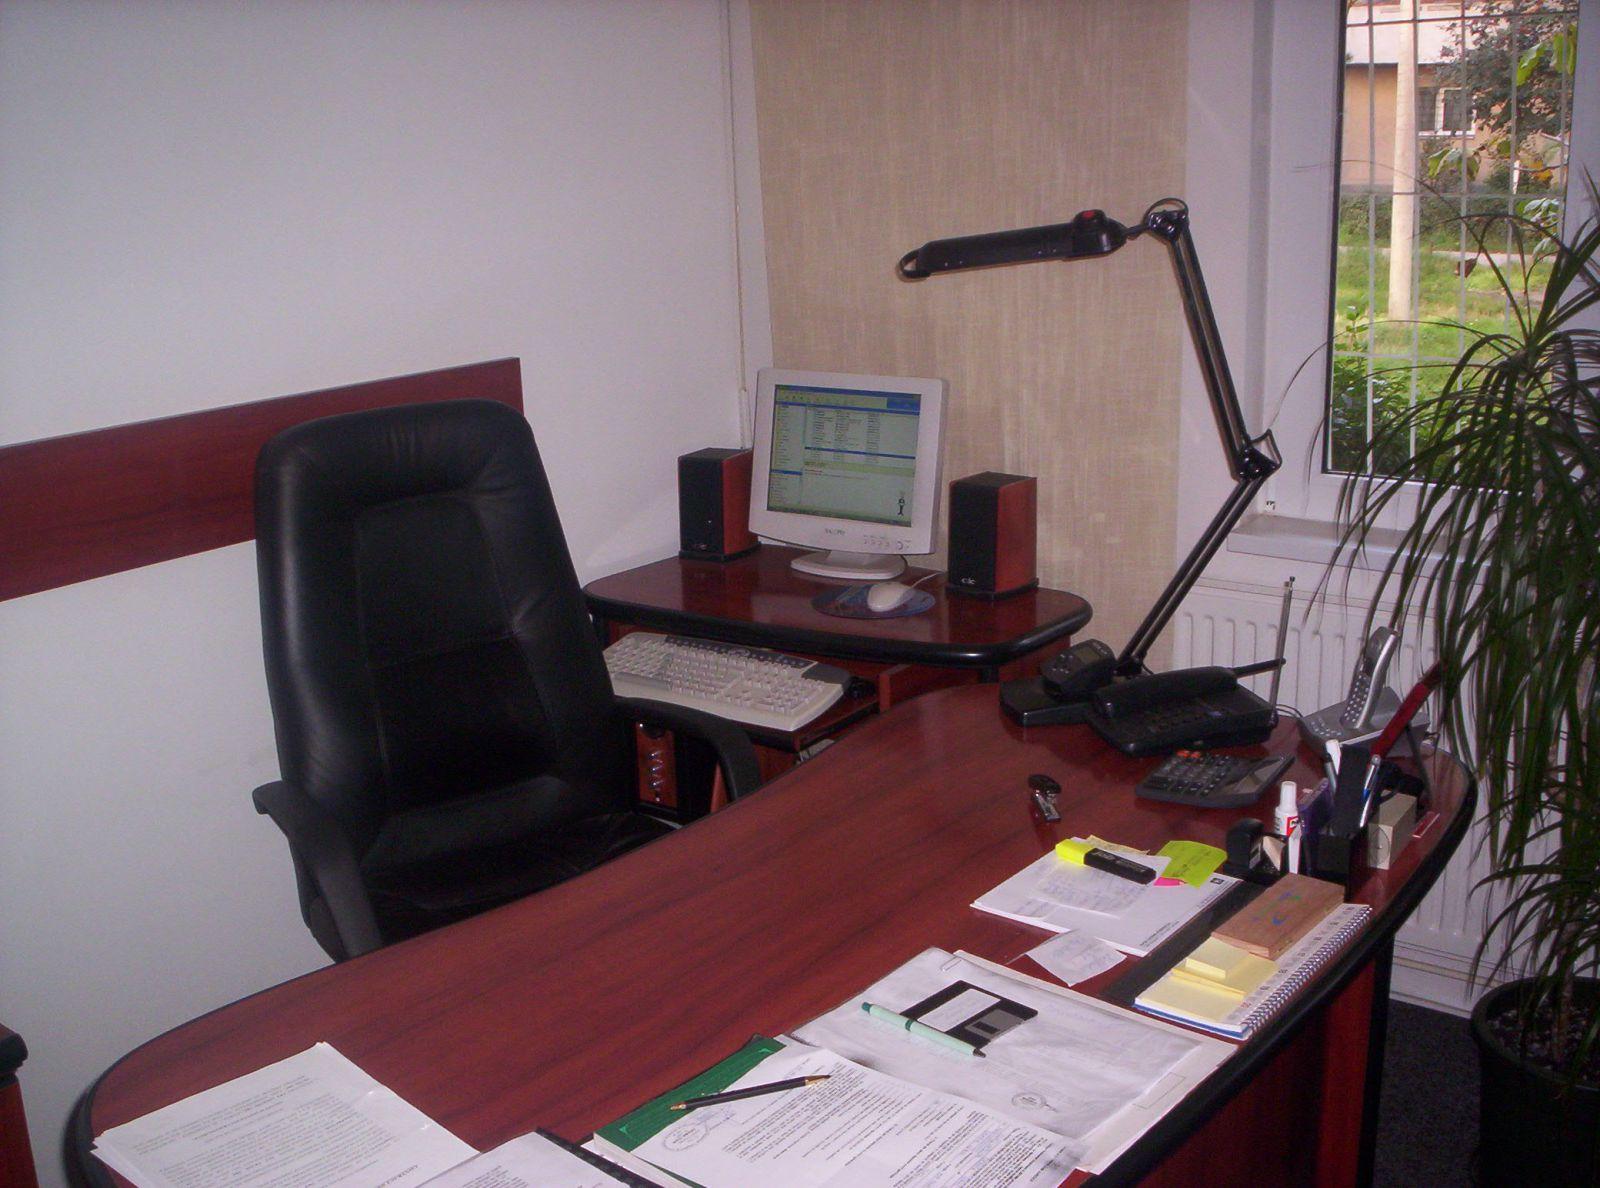 Birou de lucru..de relax...de orice :)